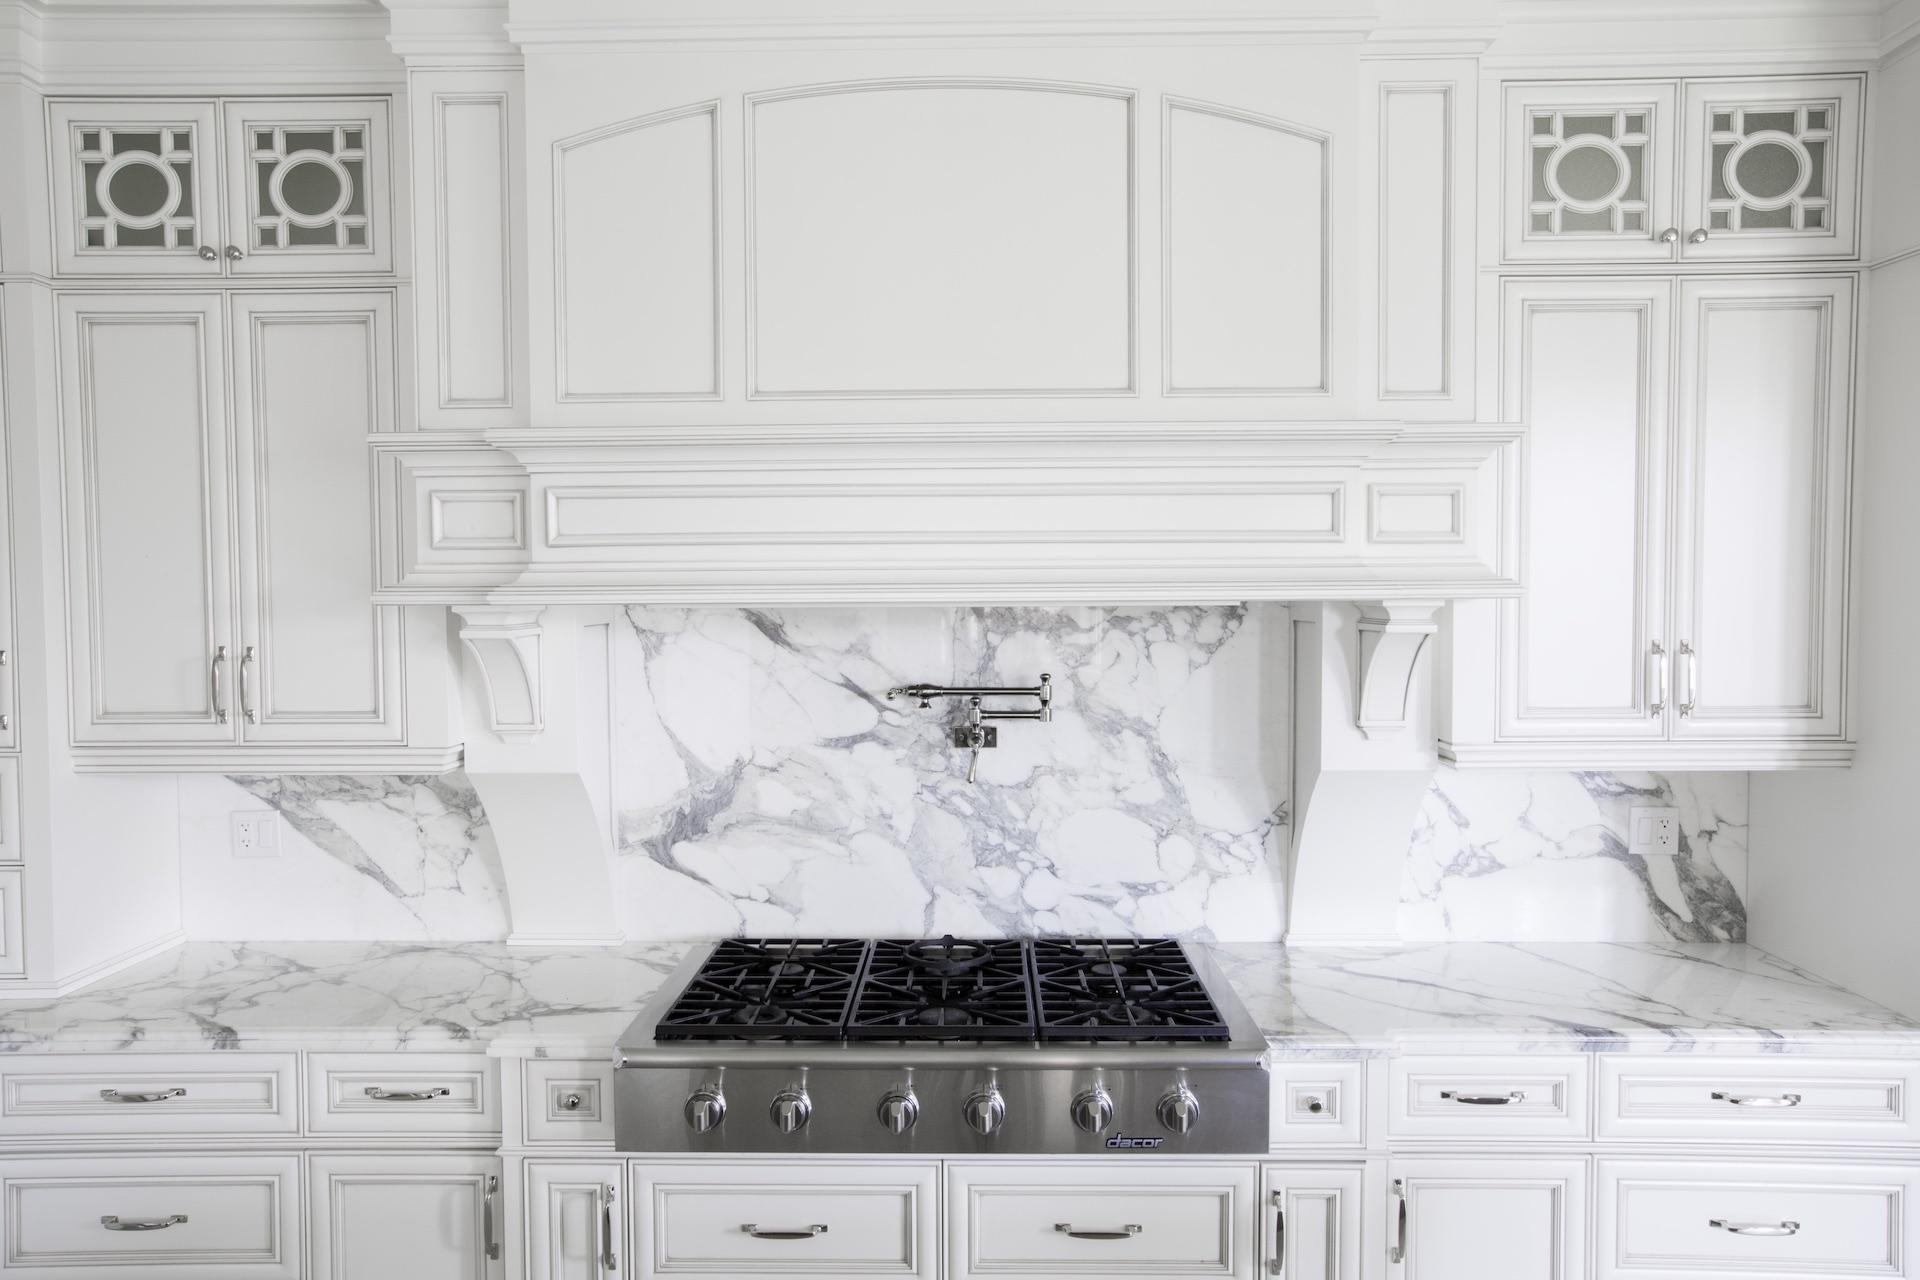 white kitchen cabinets, stove and marble backsplash